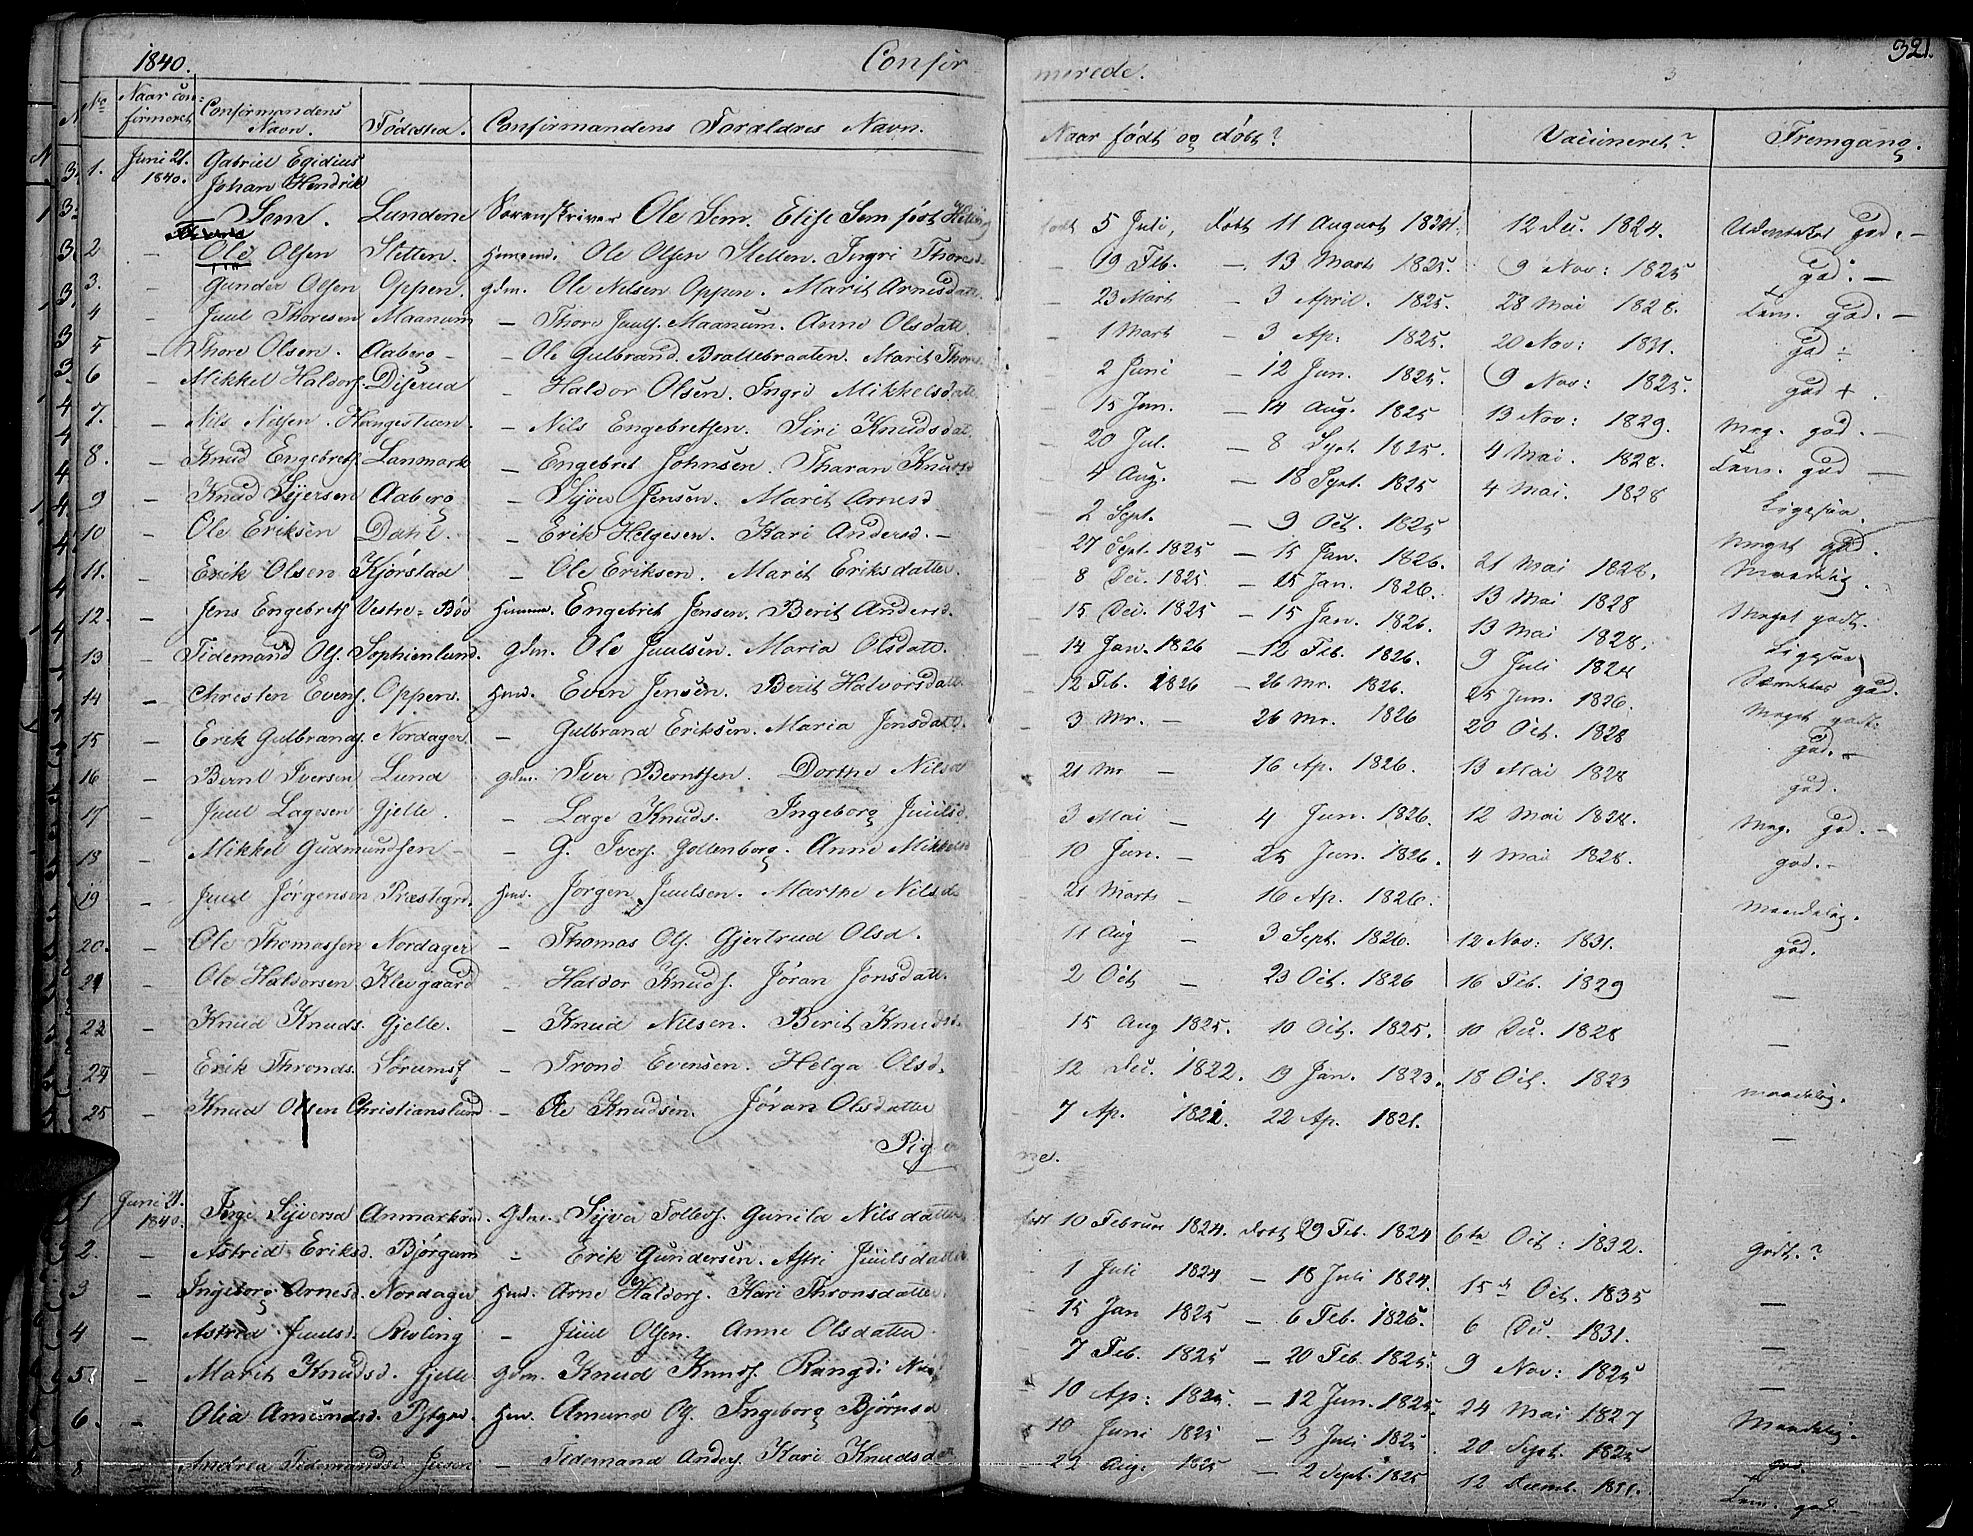 SAH, Nord-Aurdal prestekontor, Ministerialbok nr. 3, 1828-1841, s. 321